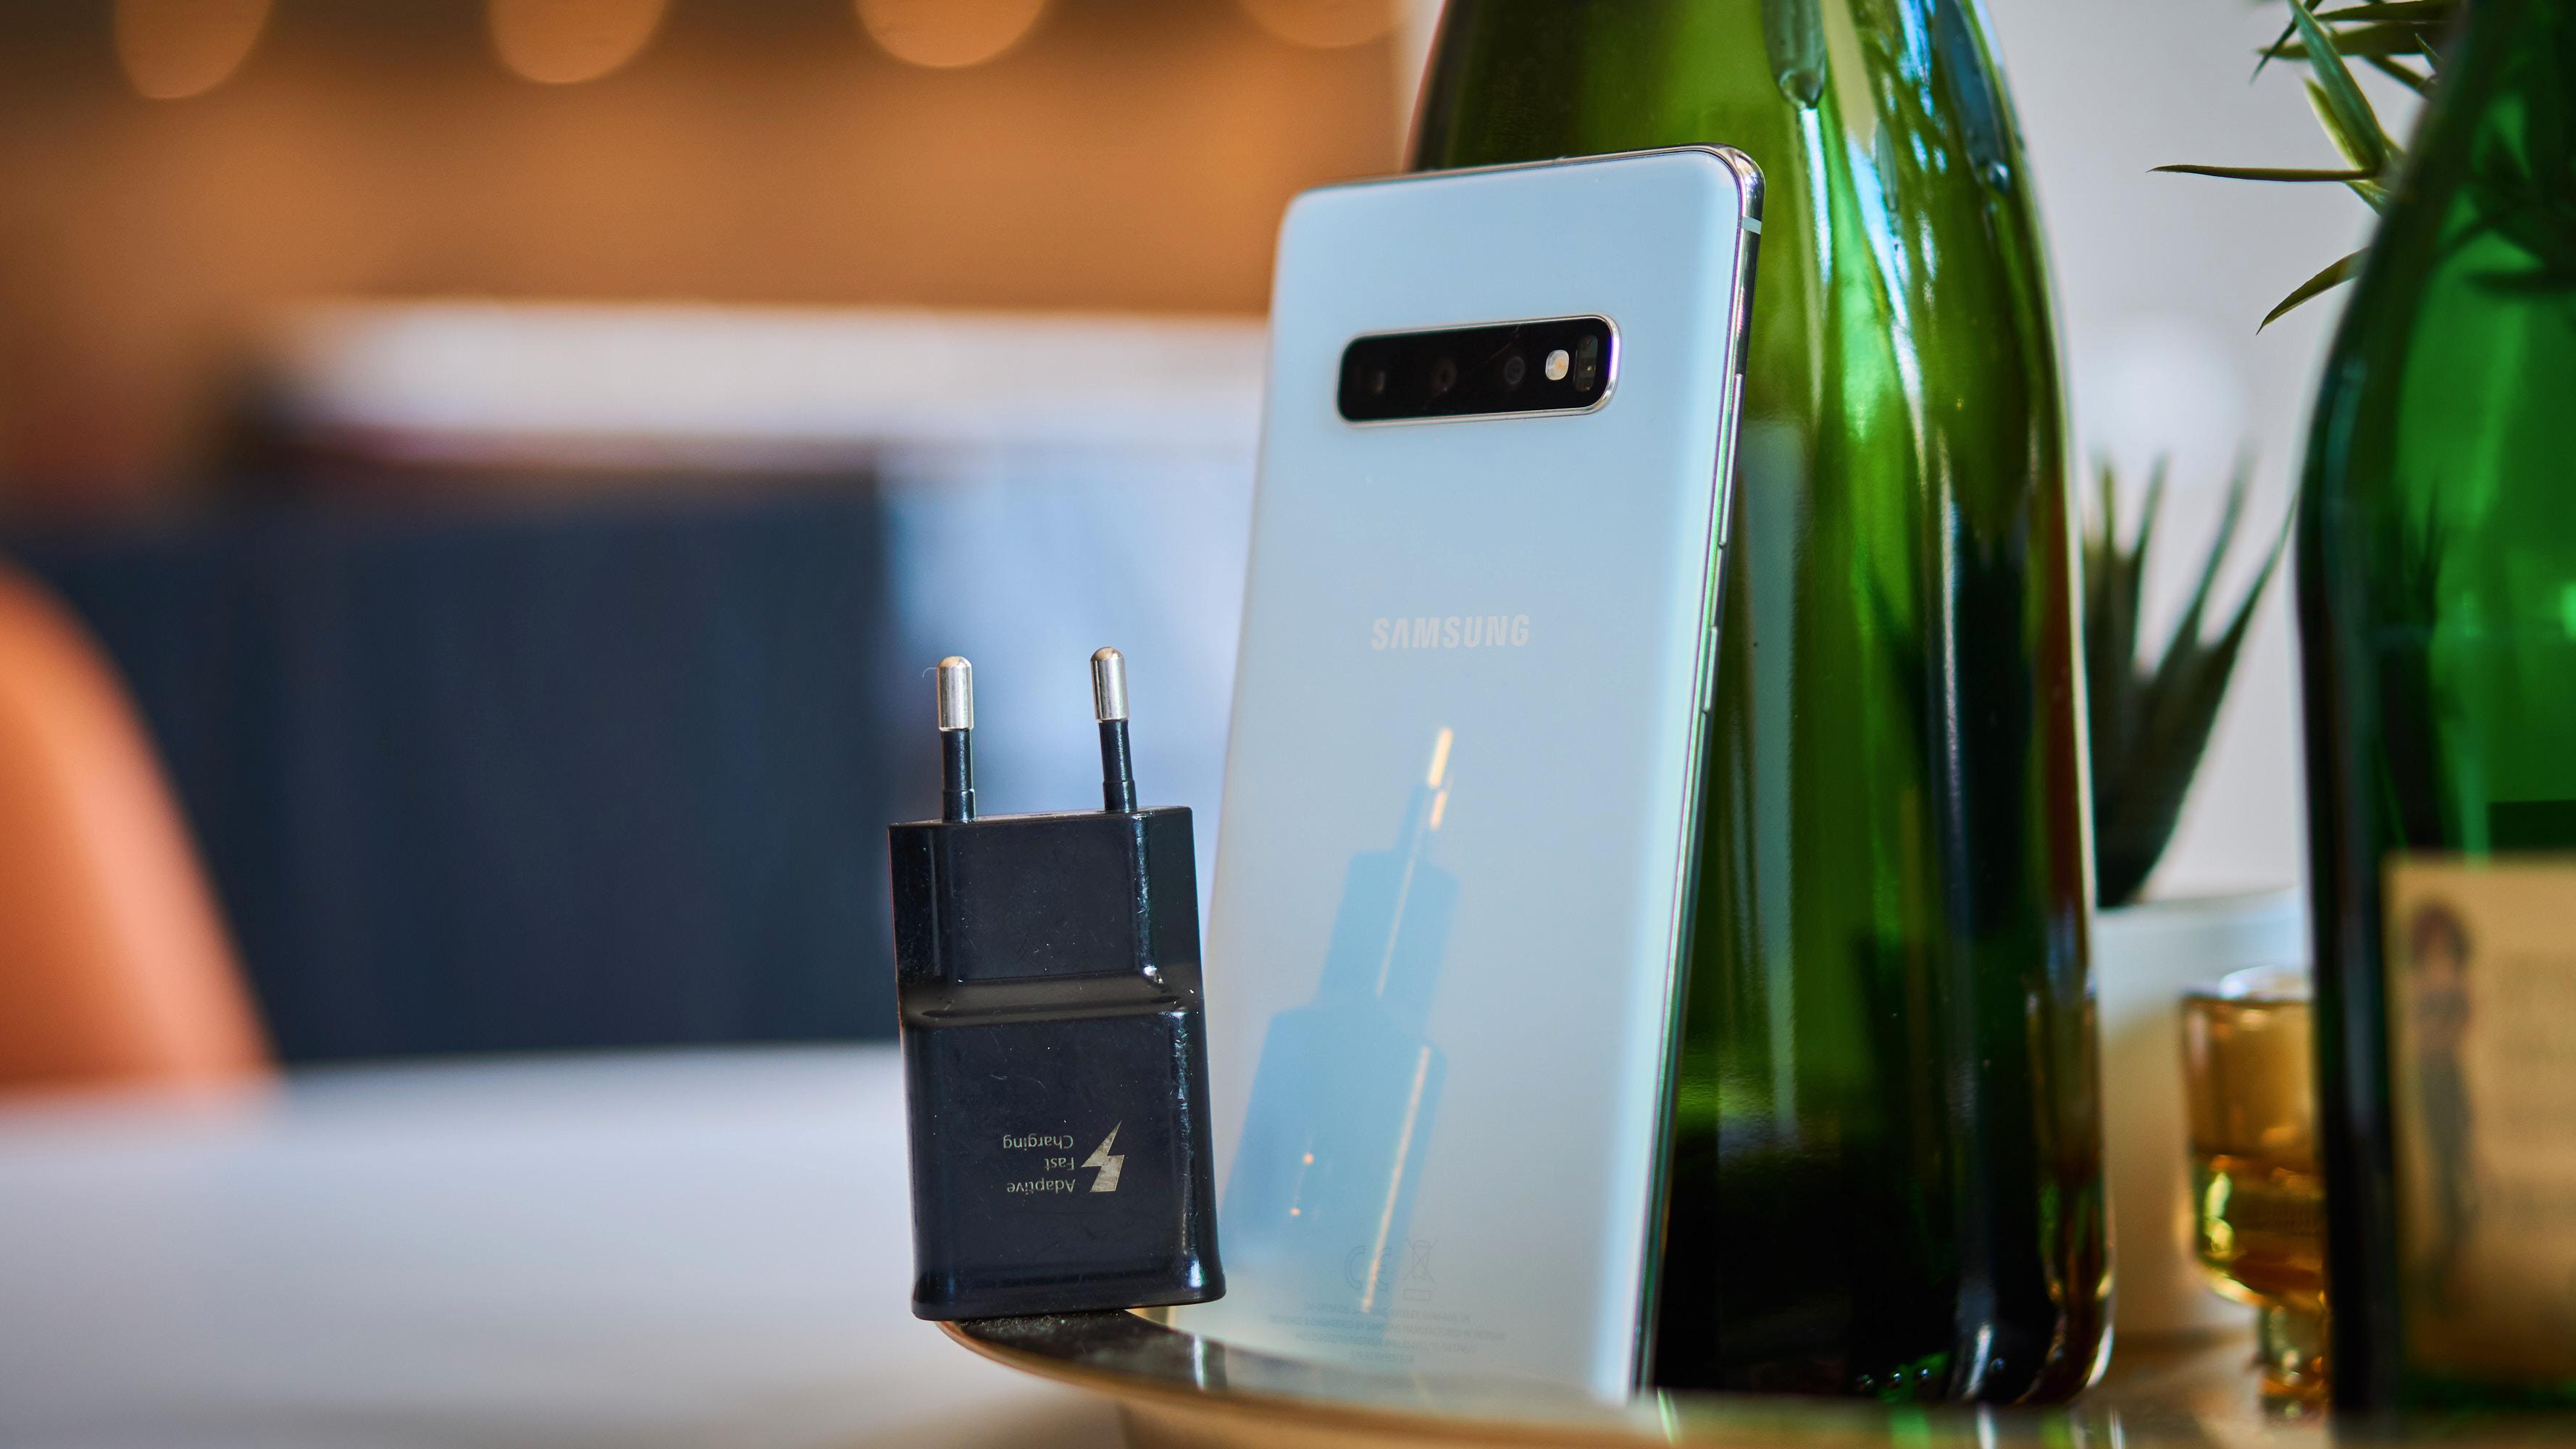 Samsung har lenge levert med ladere som denne til telefonene sine. No more?